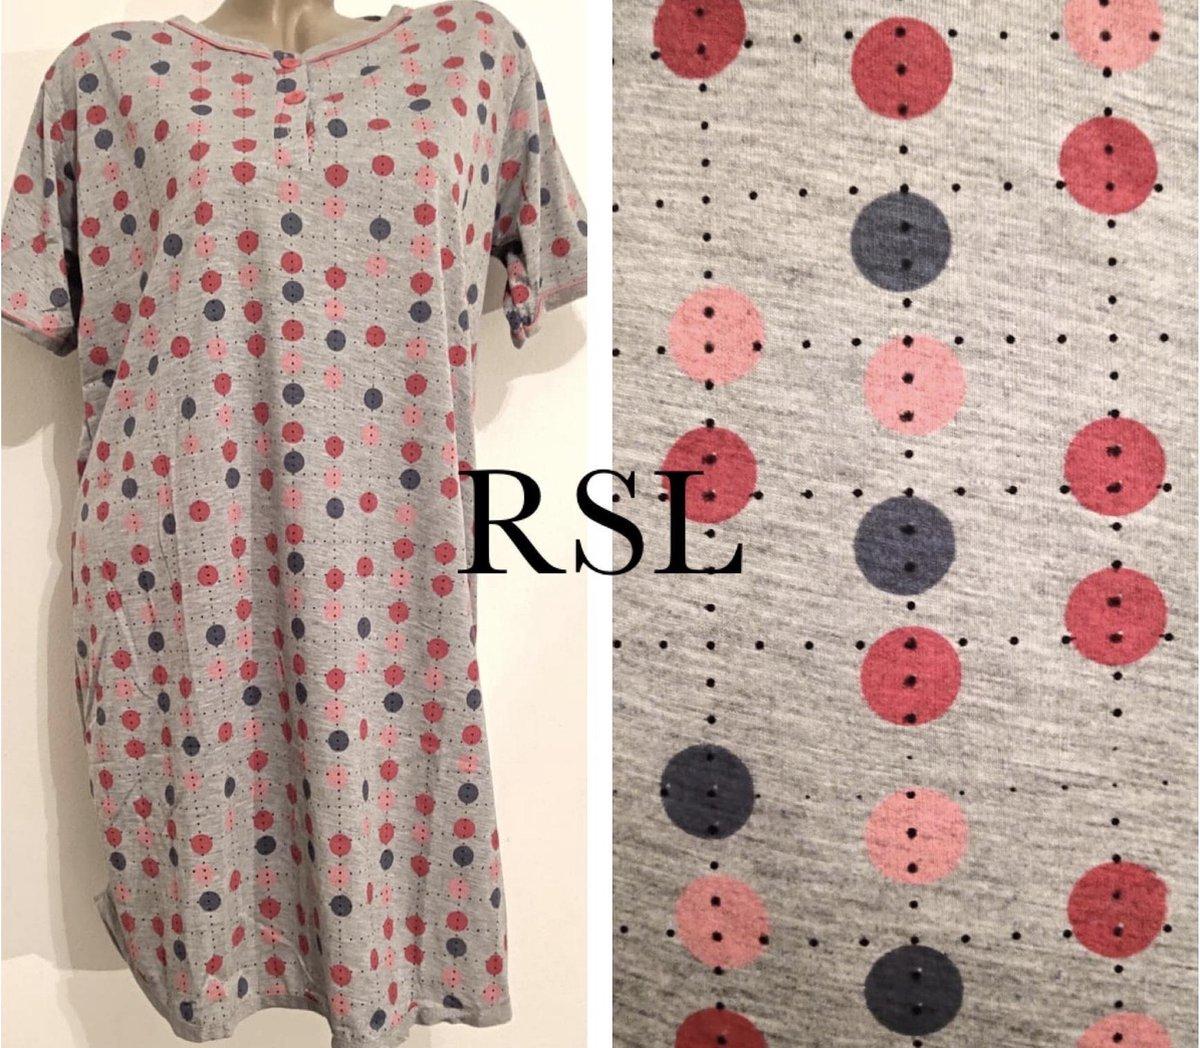 Dames nachthemd korte mouw stippen XXL 44-46 grijs/rood